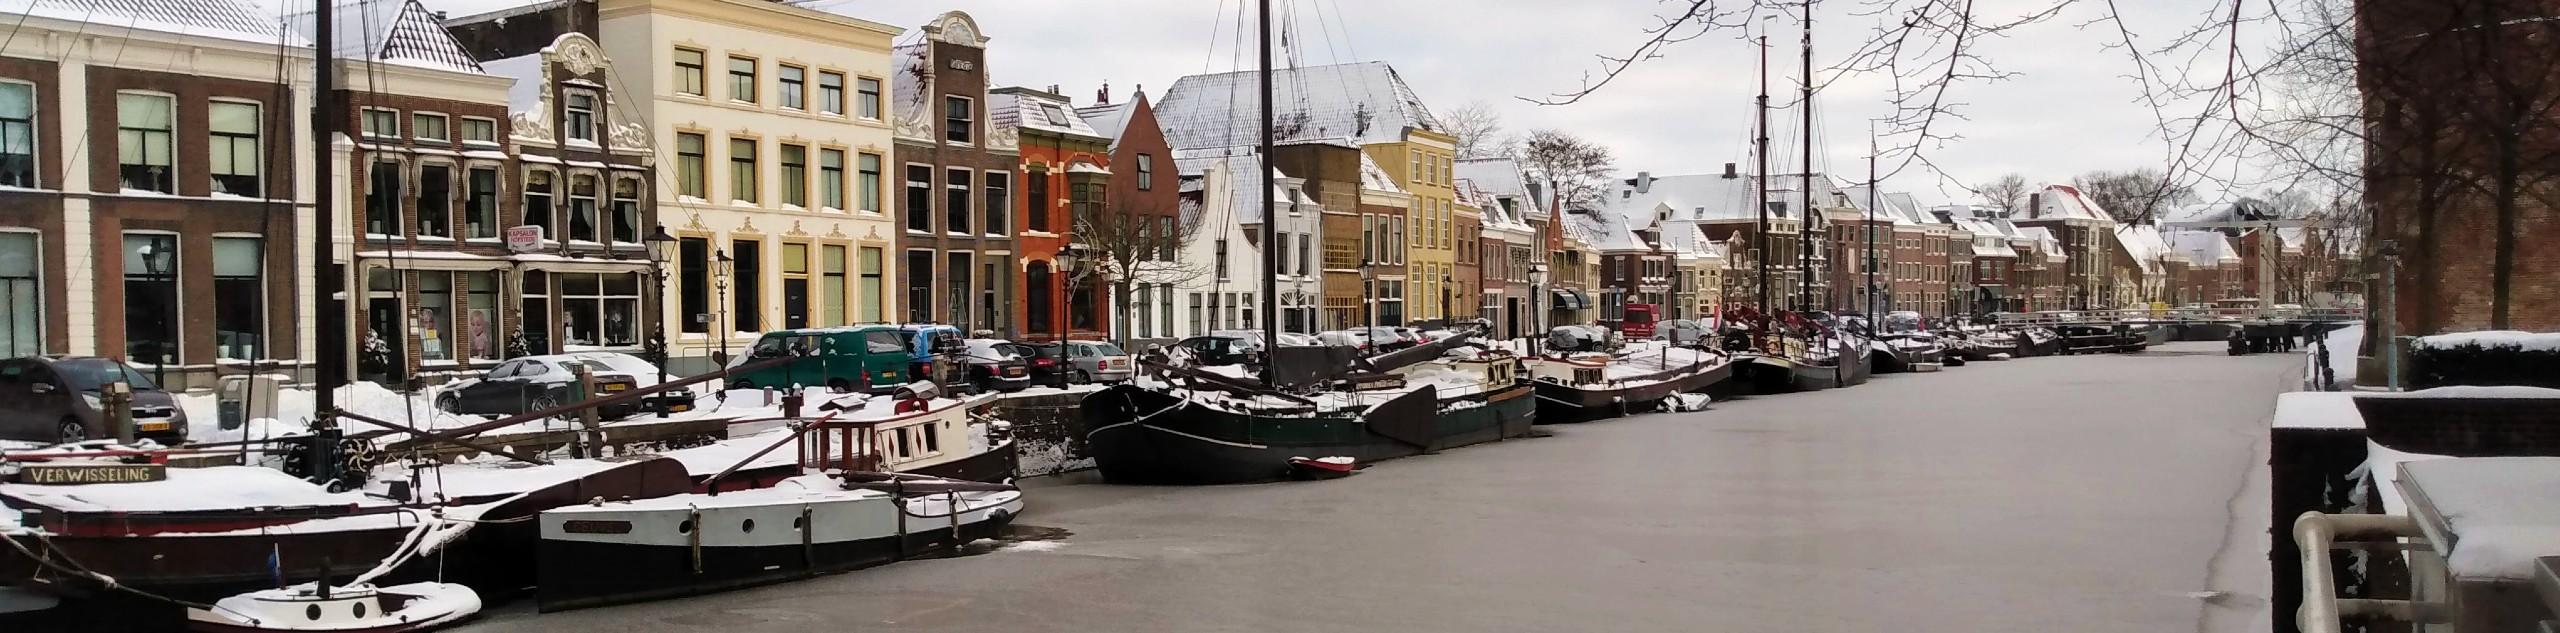 Overijjsel, Netherlands